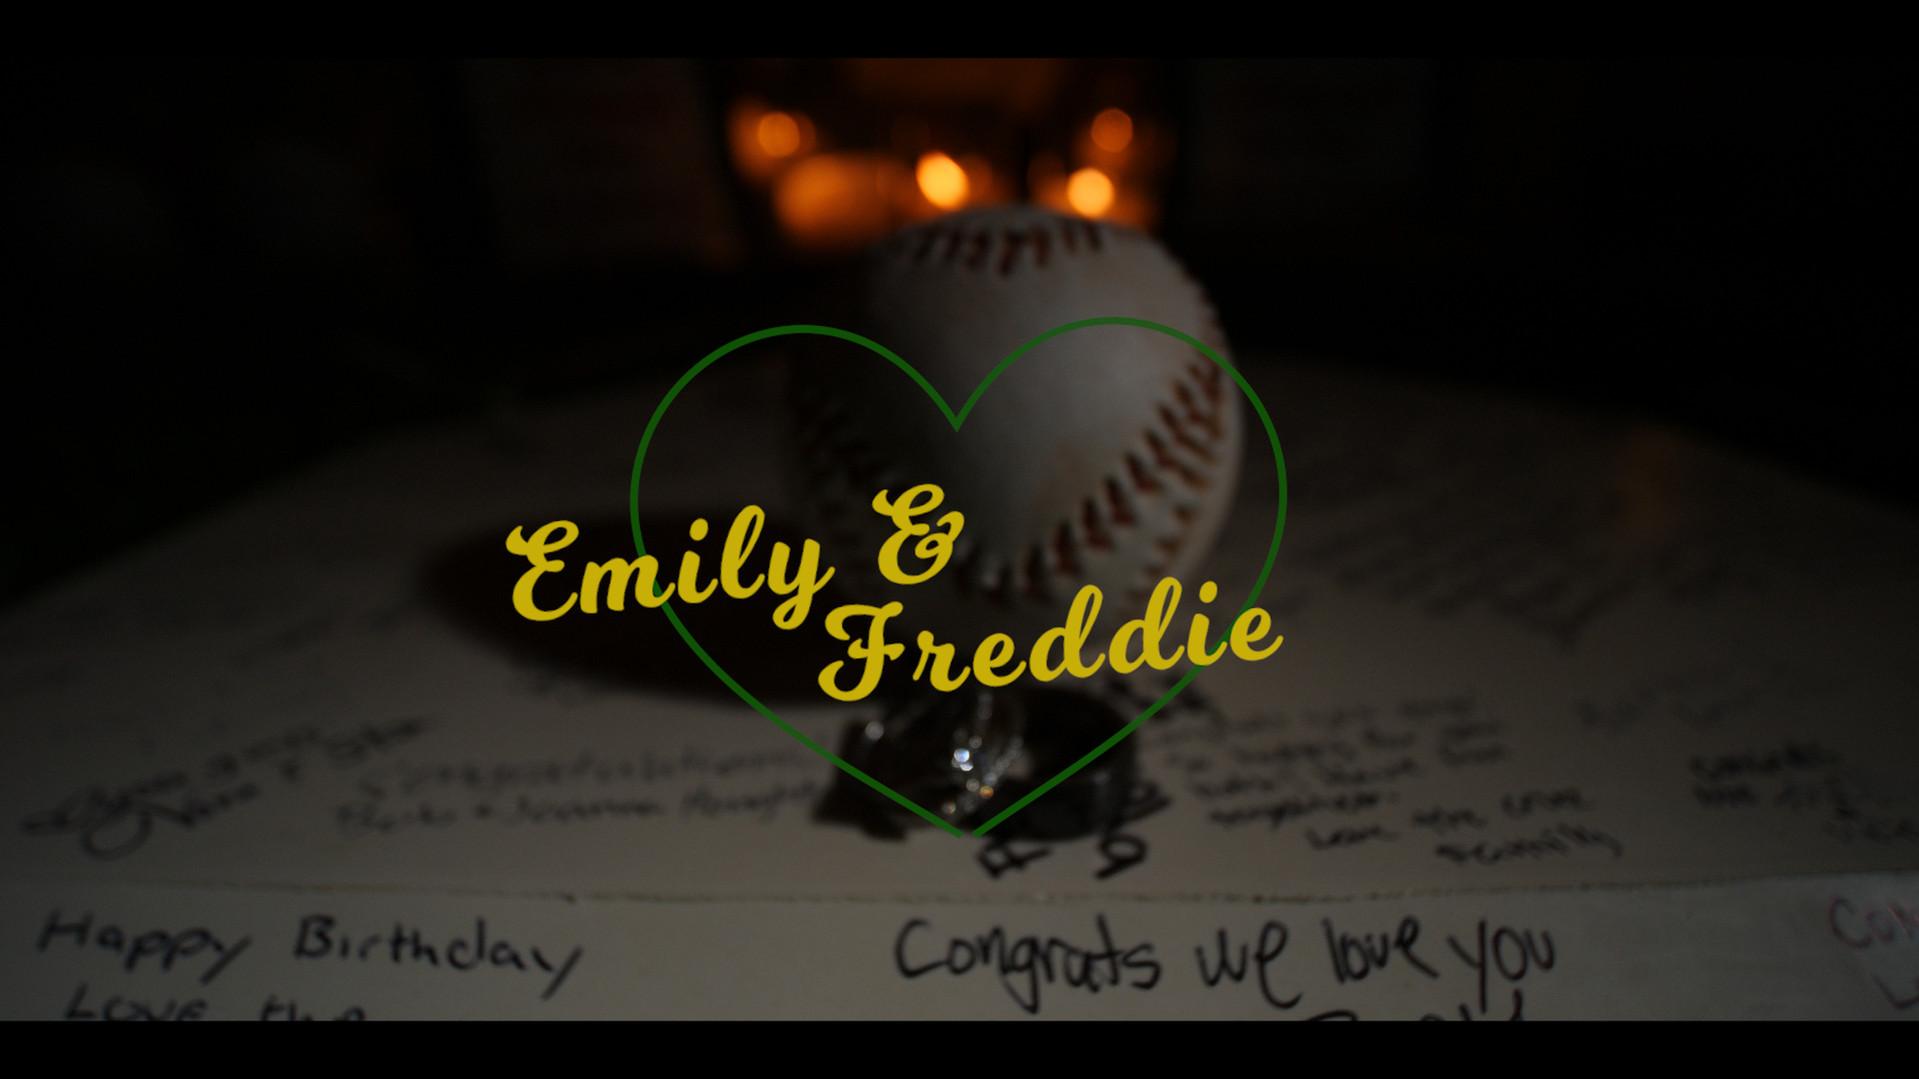 Emily and Freddie